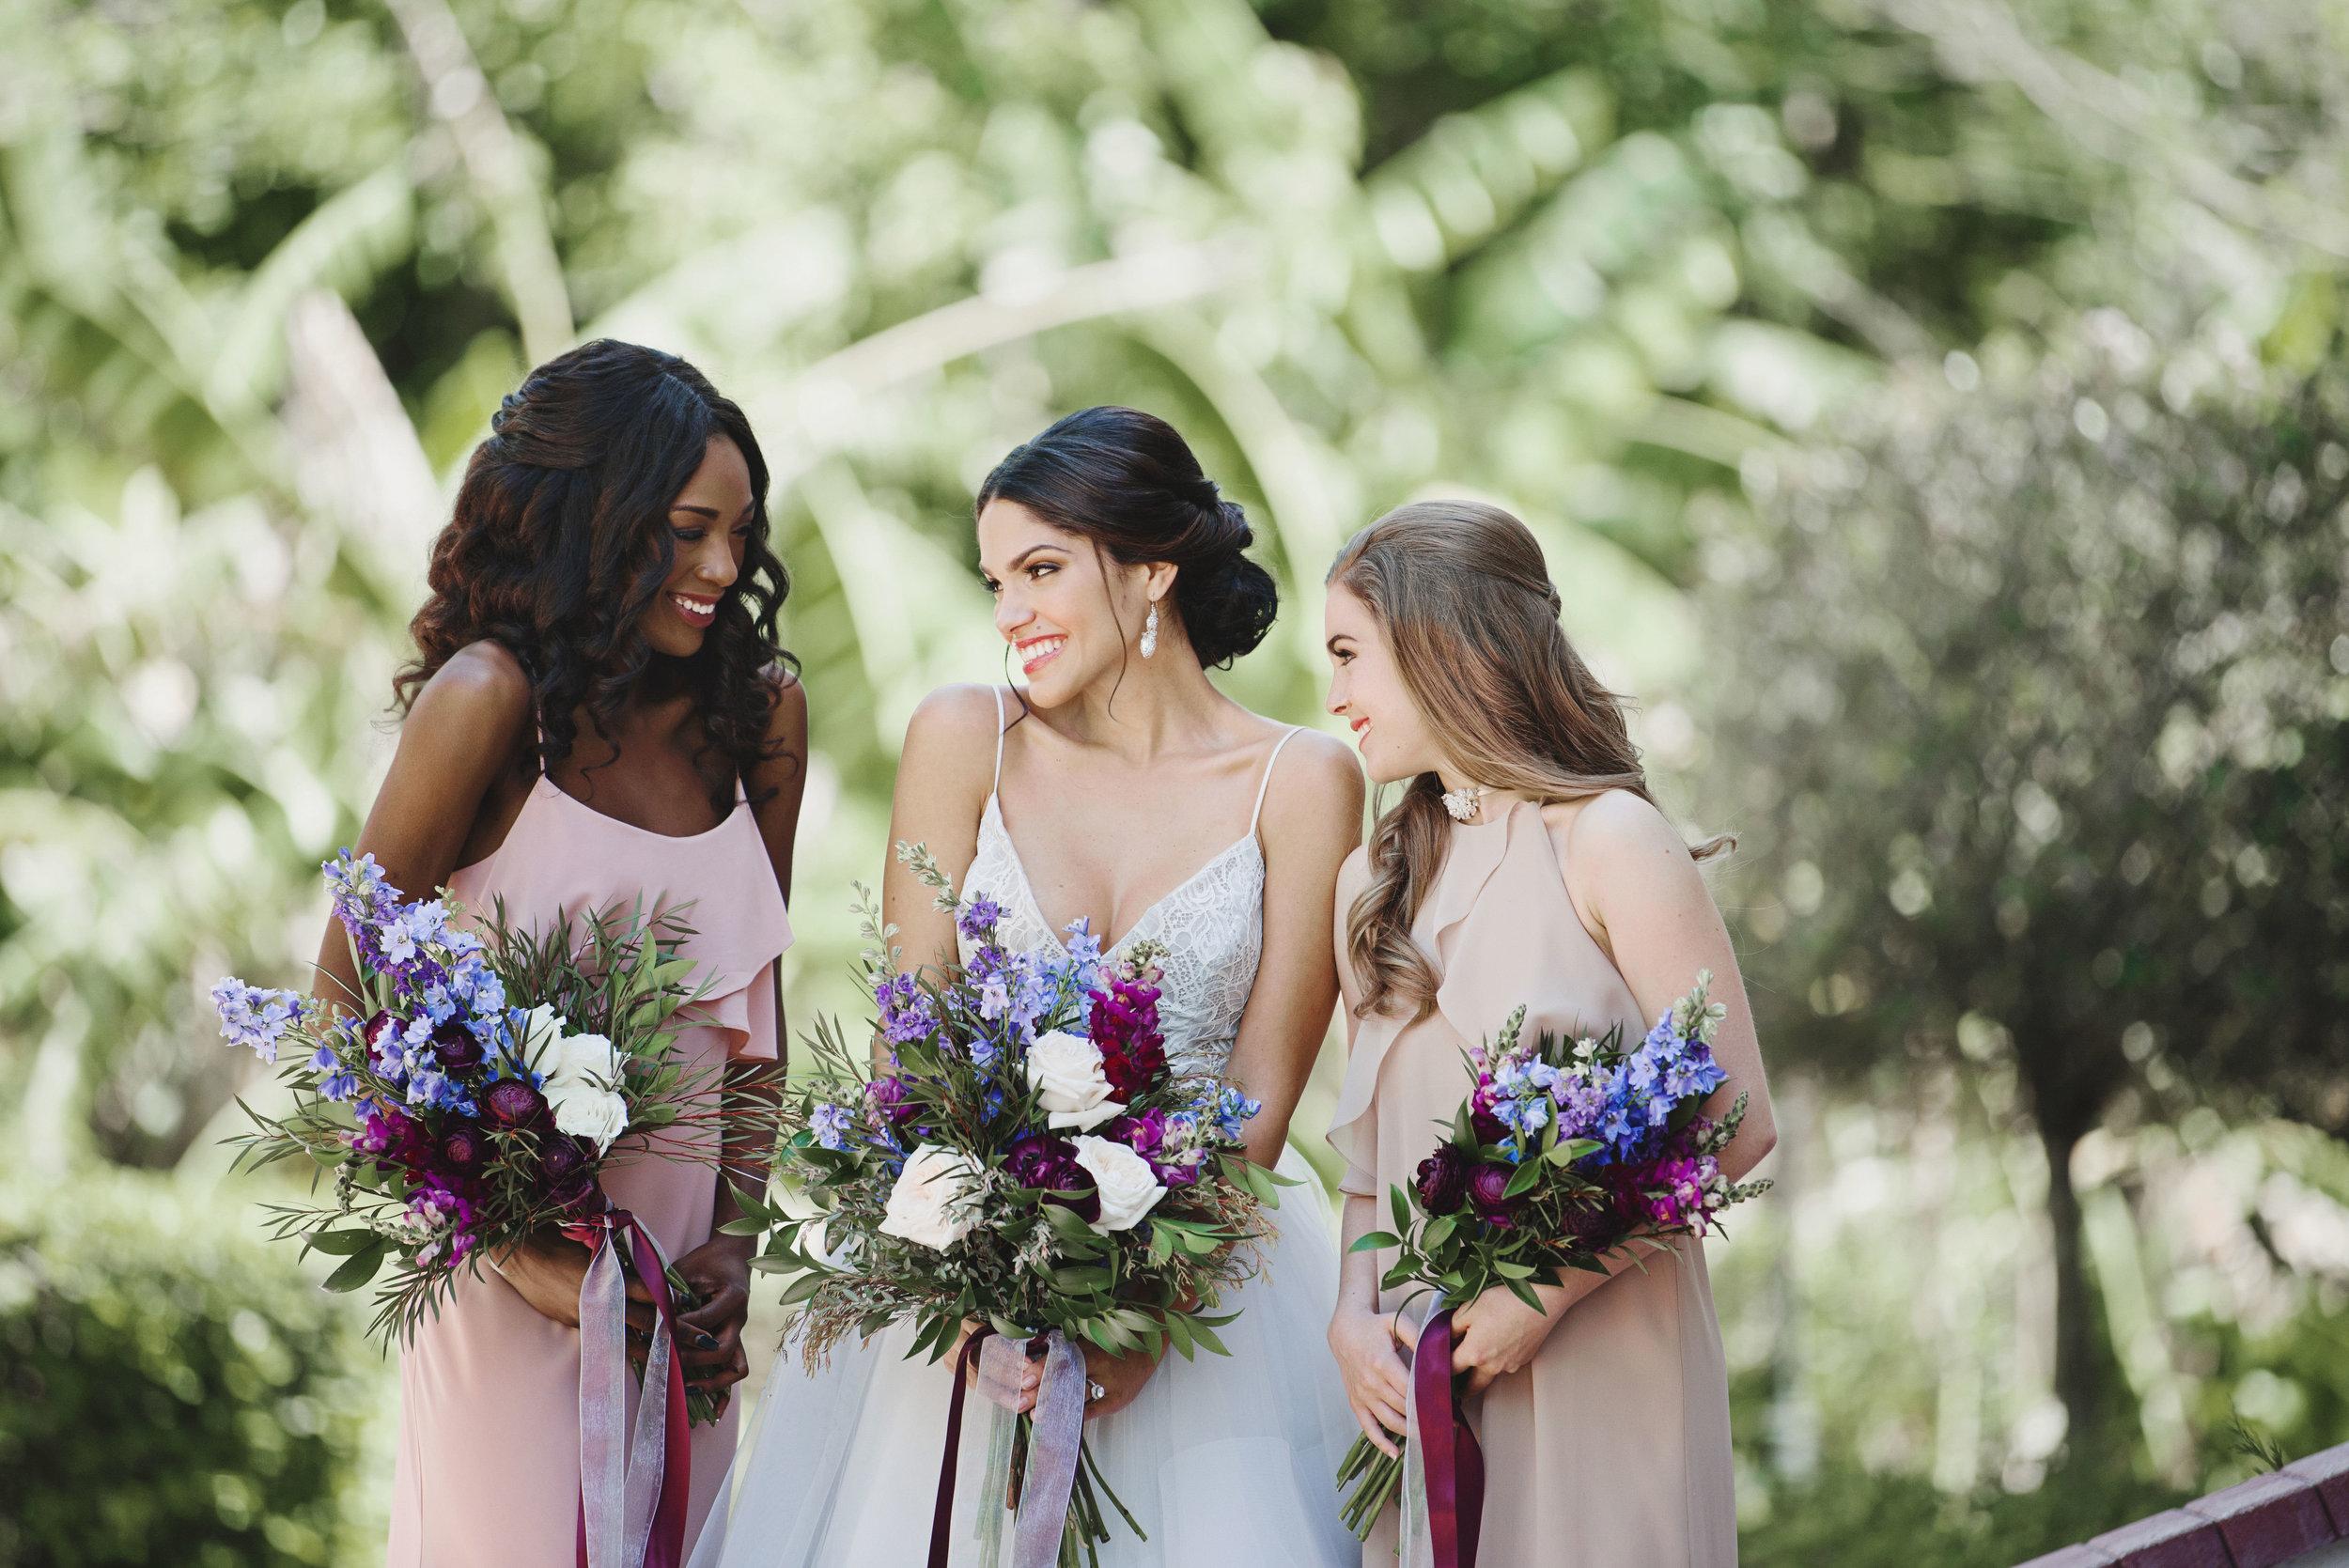 Hamilton Musical Wedding Ideas | Bridal Inspiration037GreenPearlPhotographyTampa_FLHAMILTON.JPG